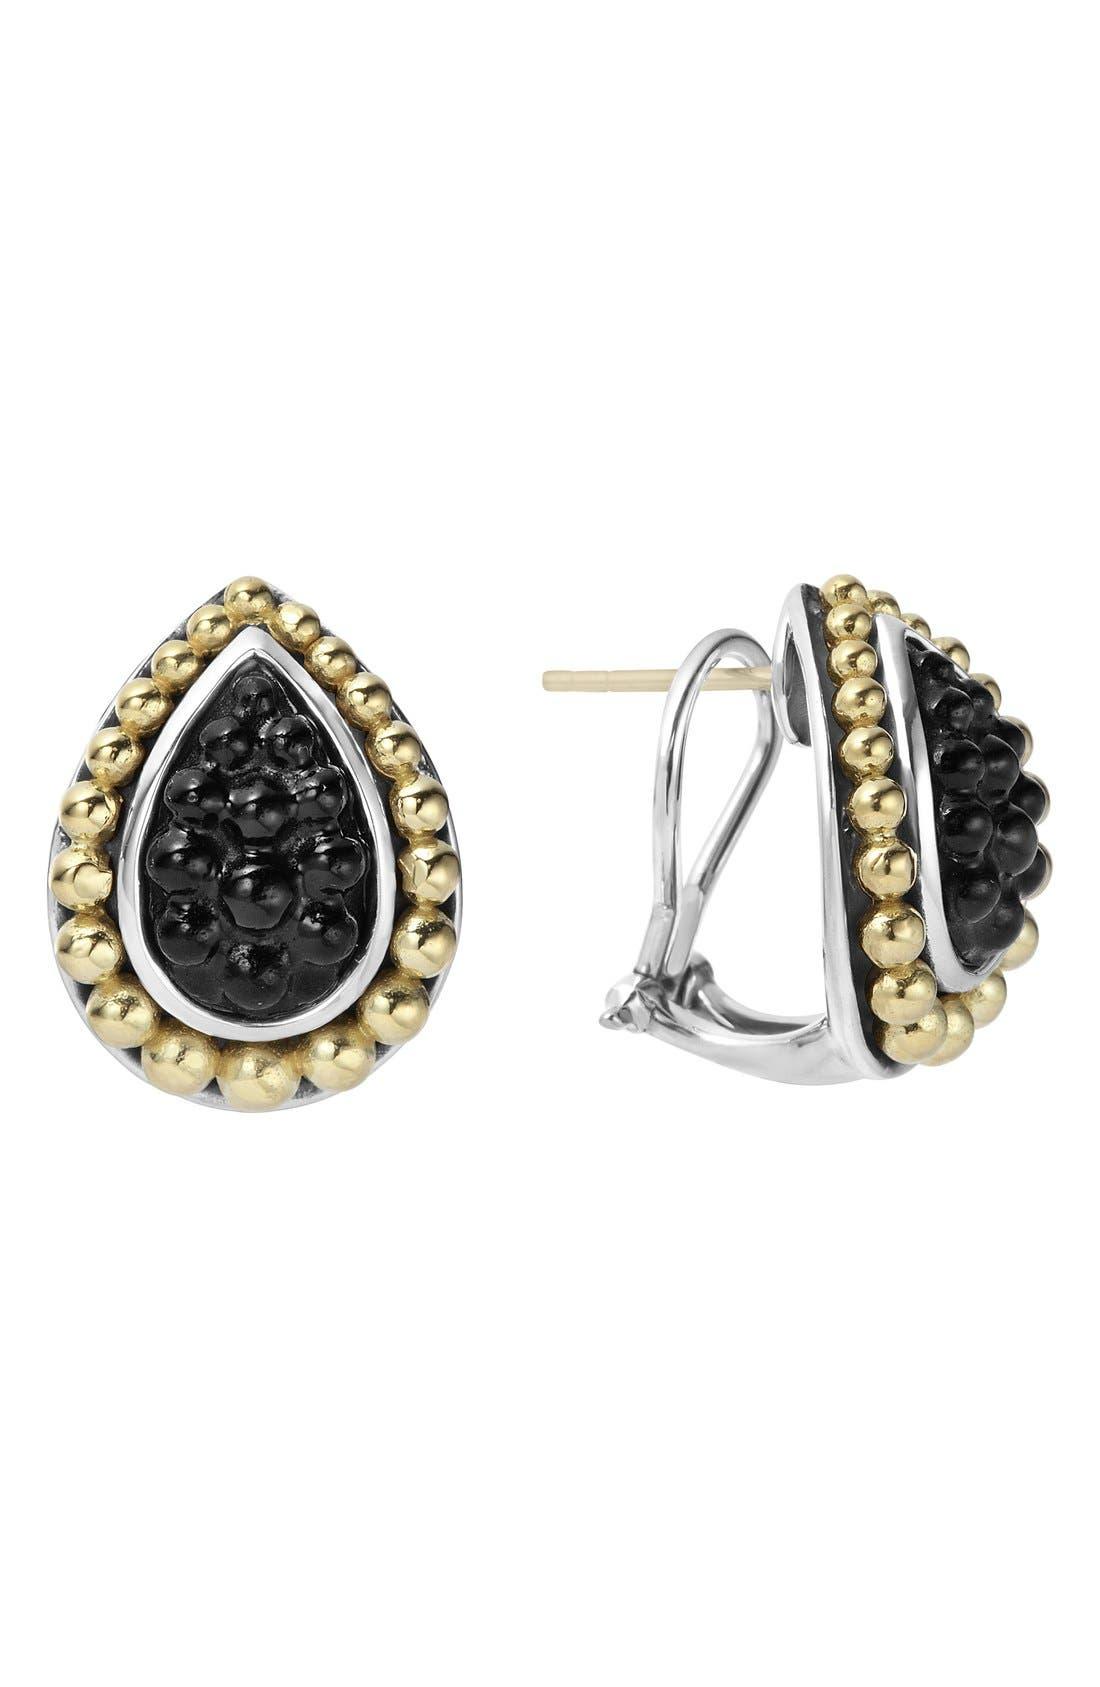 LAGOS Black Caviar Stud Earrings